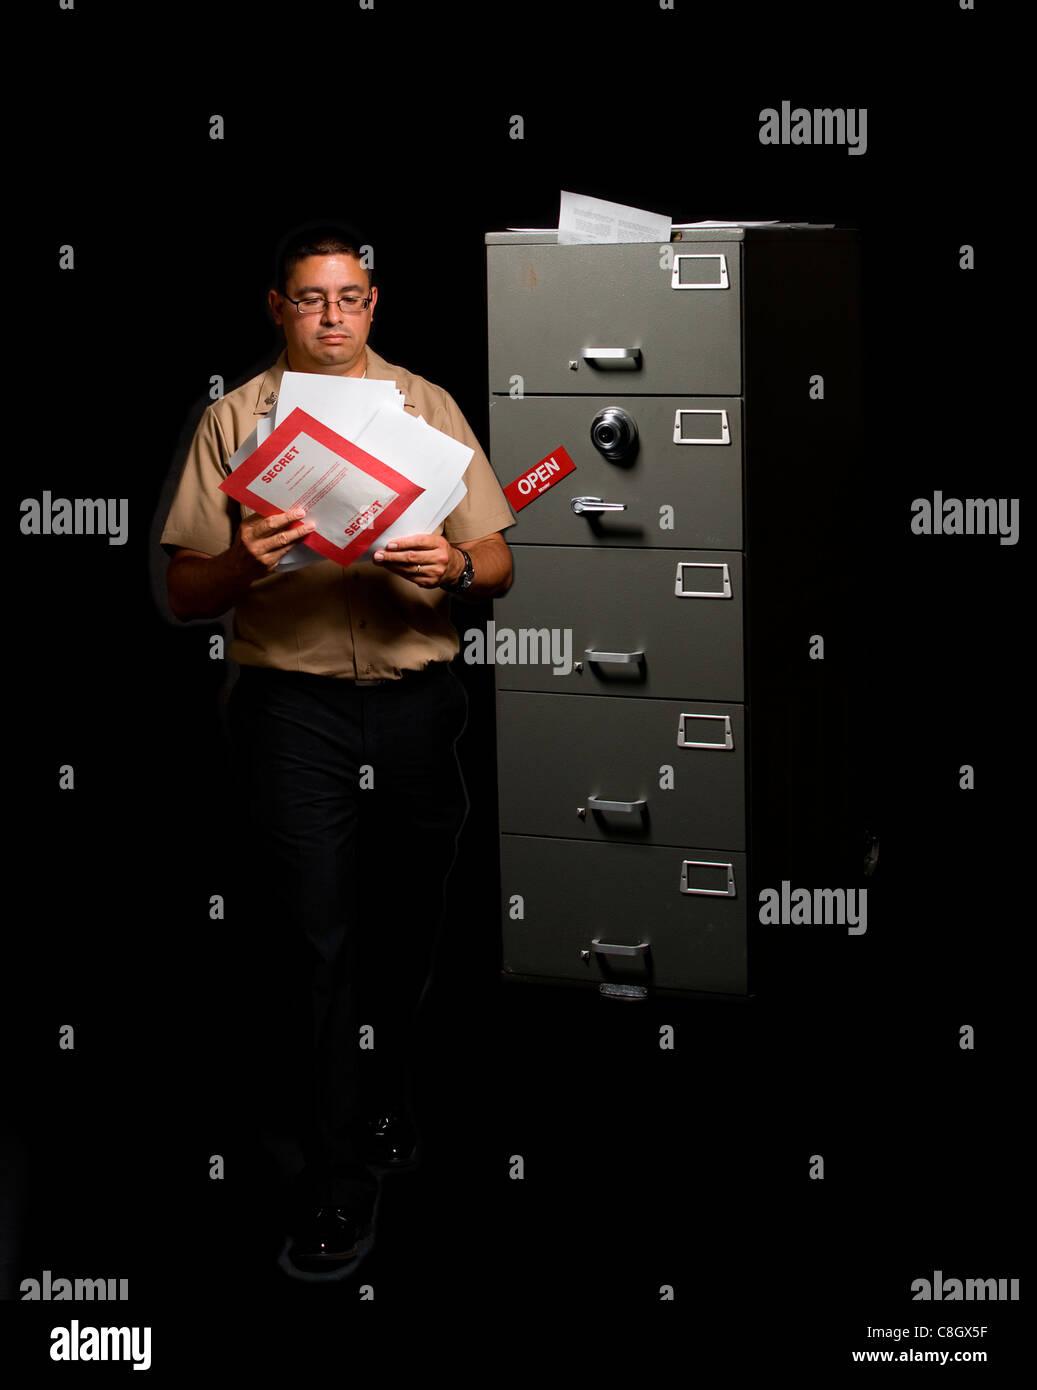 Gun Cabinet Imágenes De Stock & Gun Cabinet Fotos De Stock - Alamy